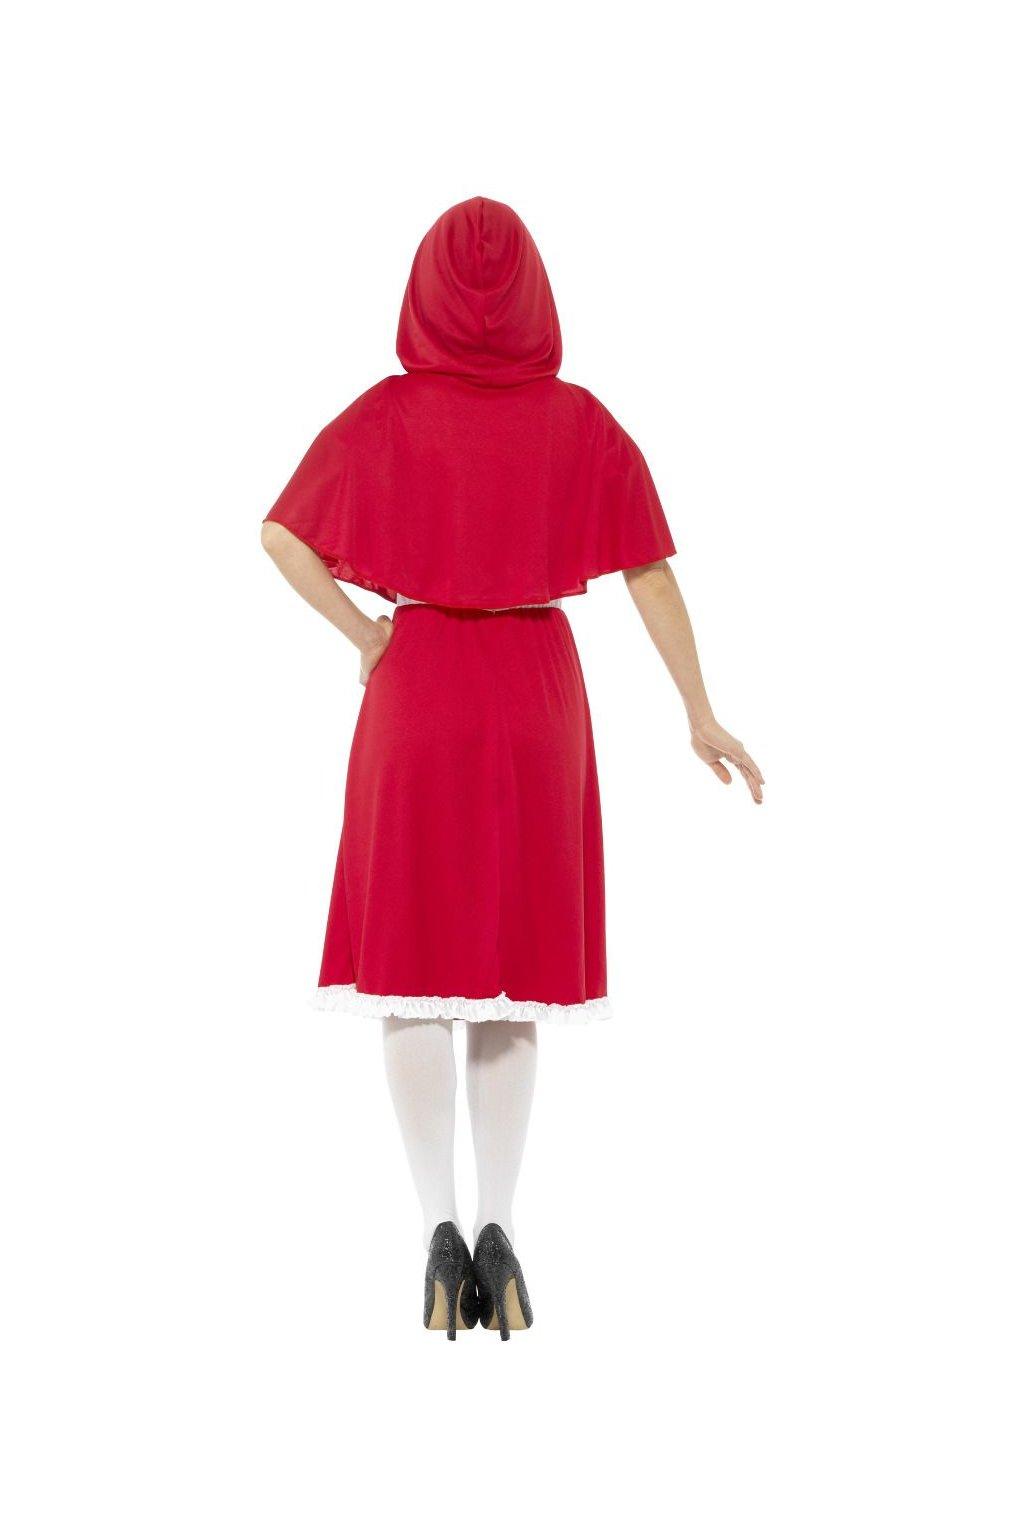 Karkulka - dámský lostým Red Riding Hood